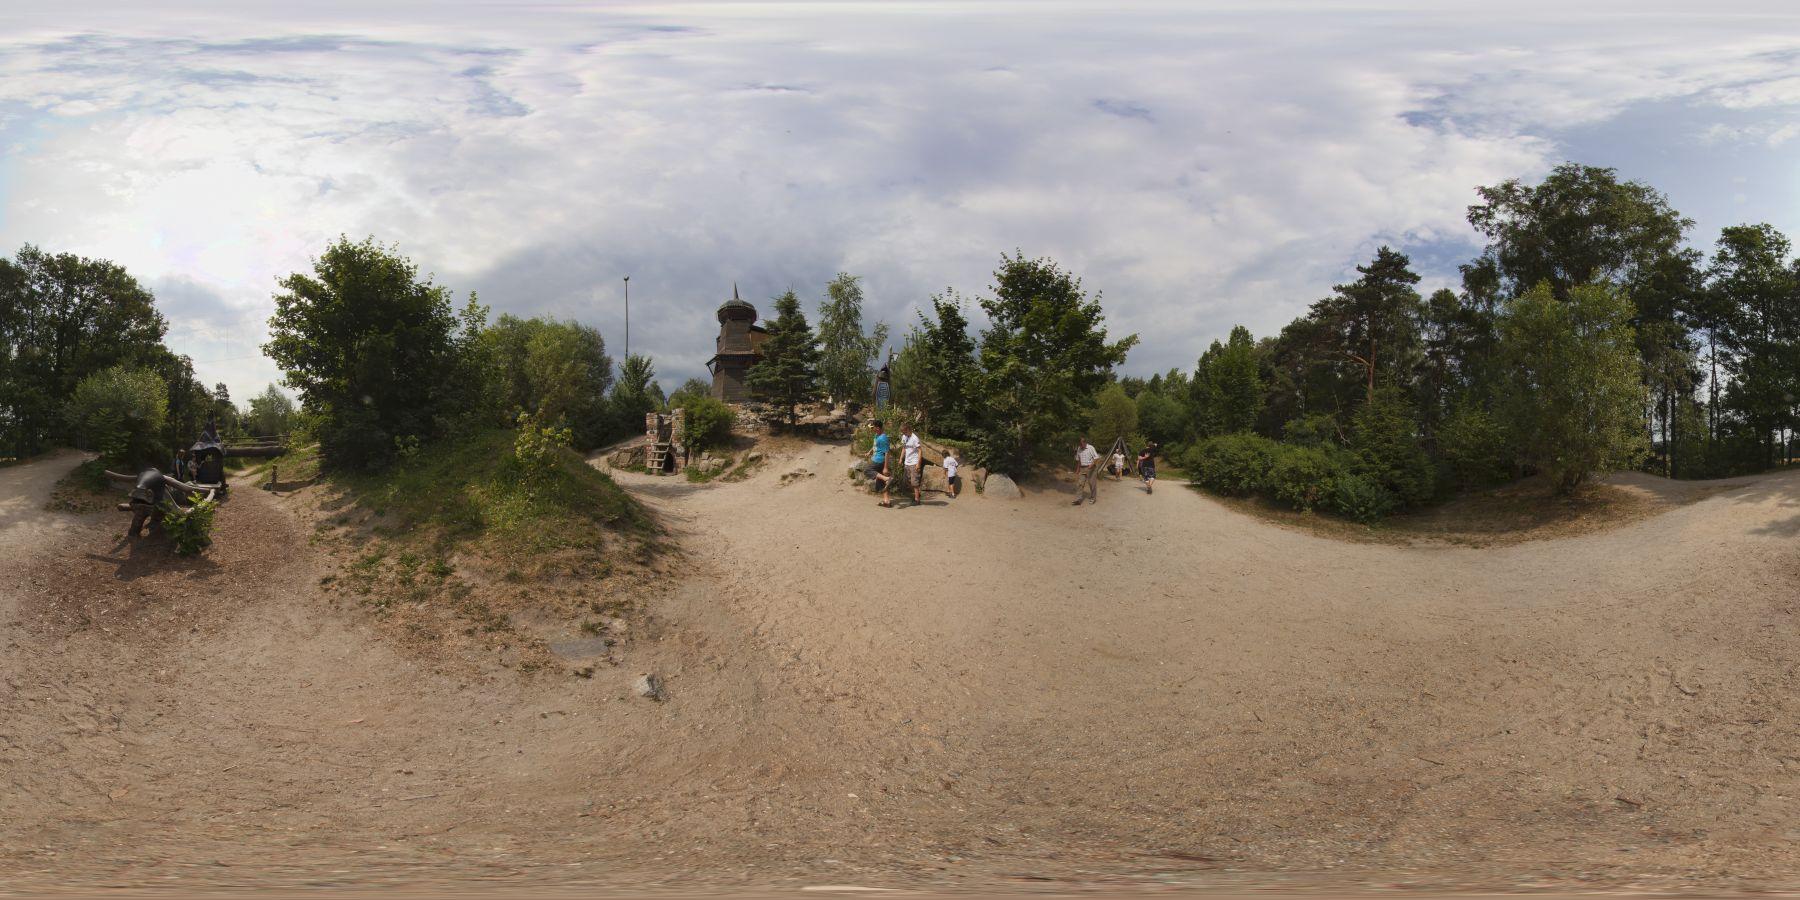 Kulturinsel Einsiedel 1